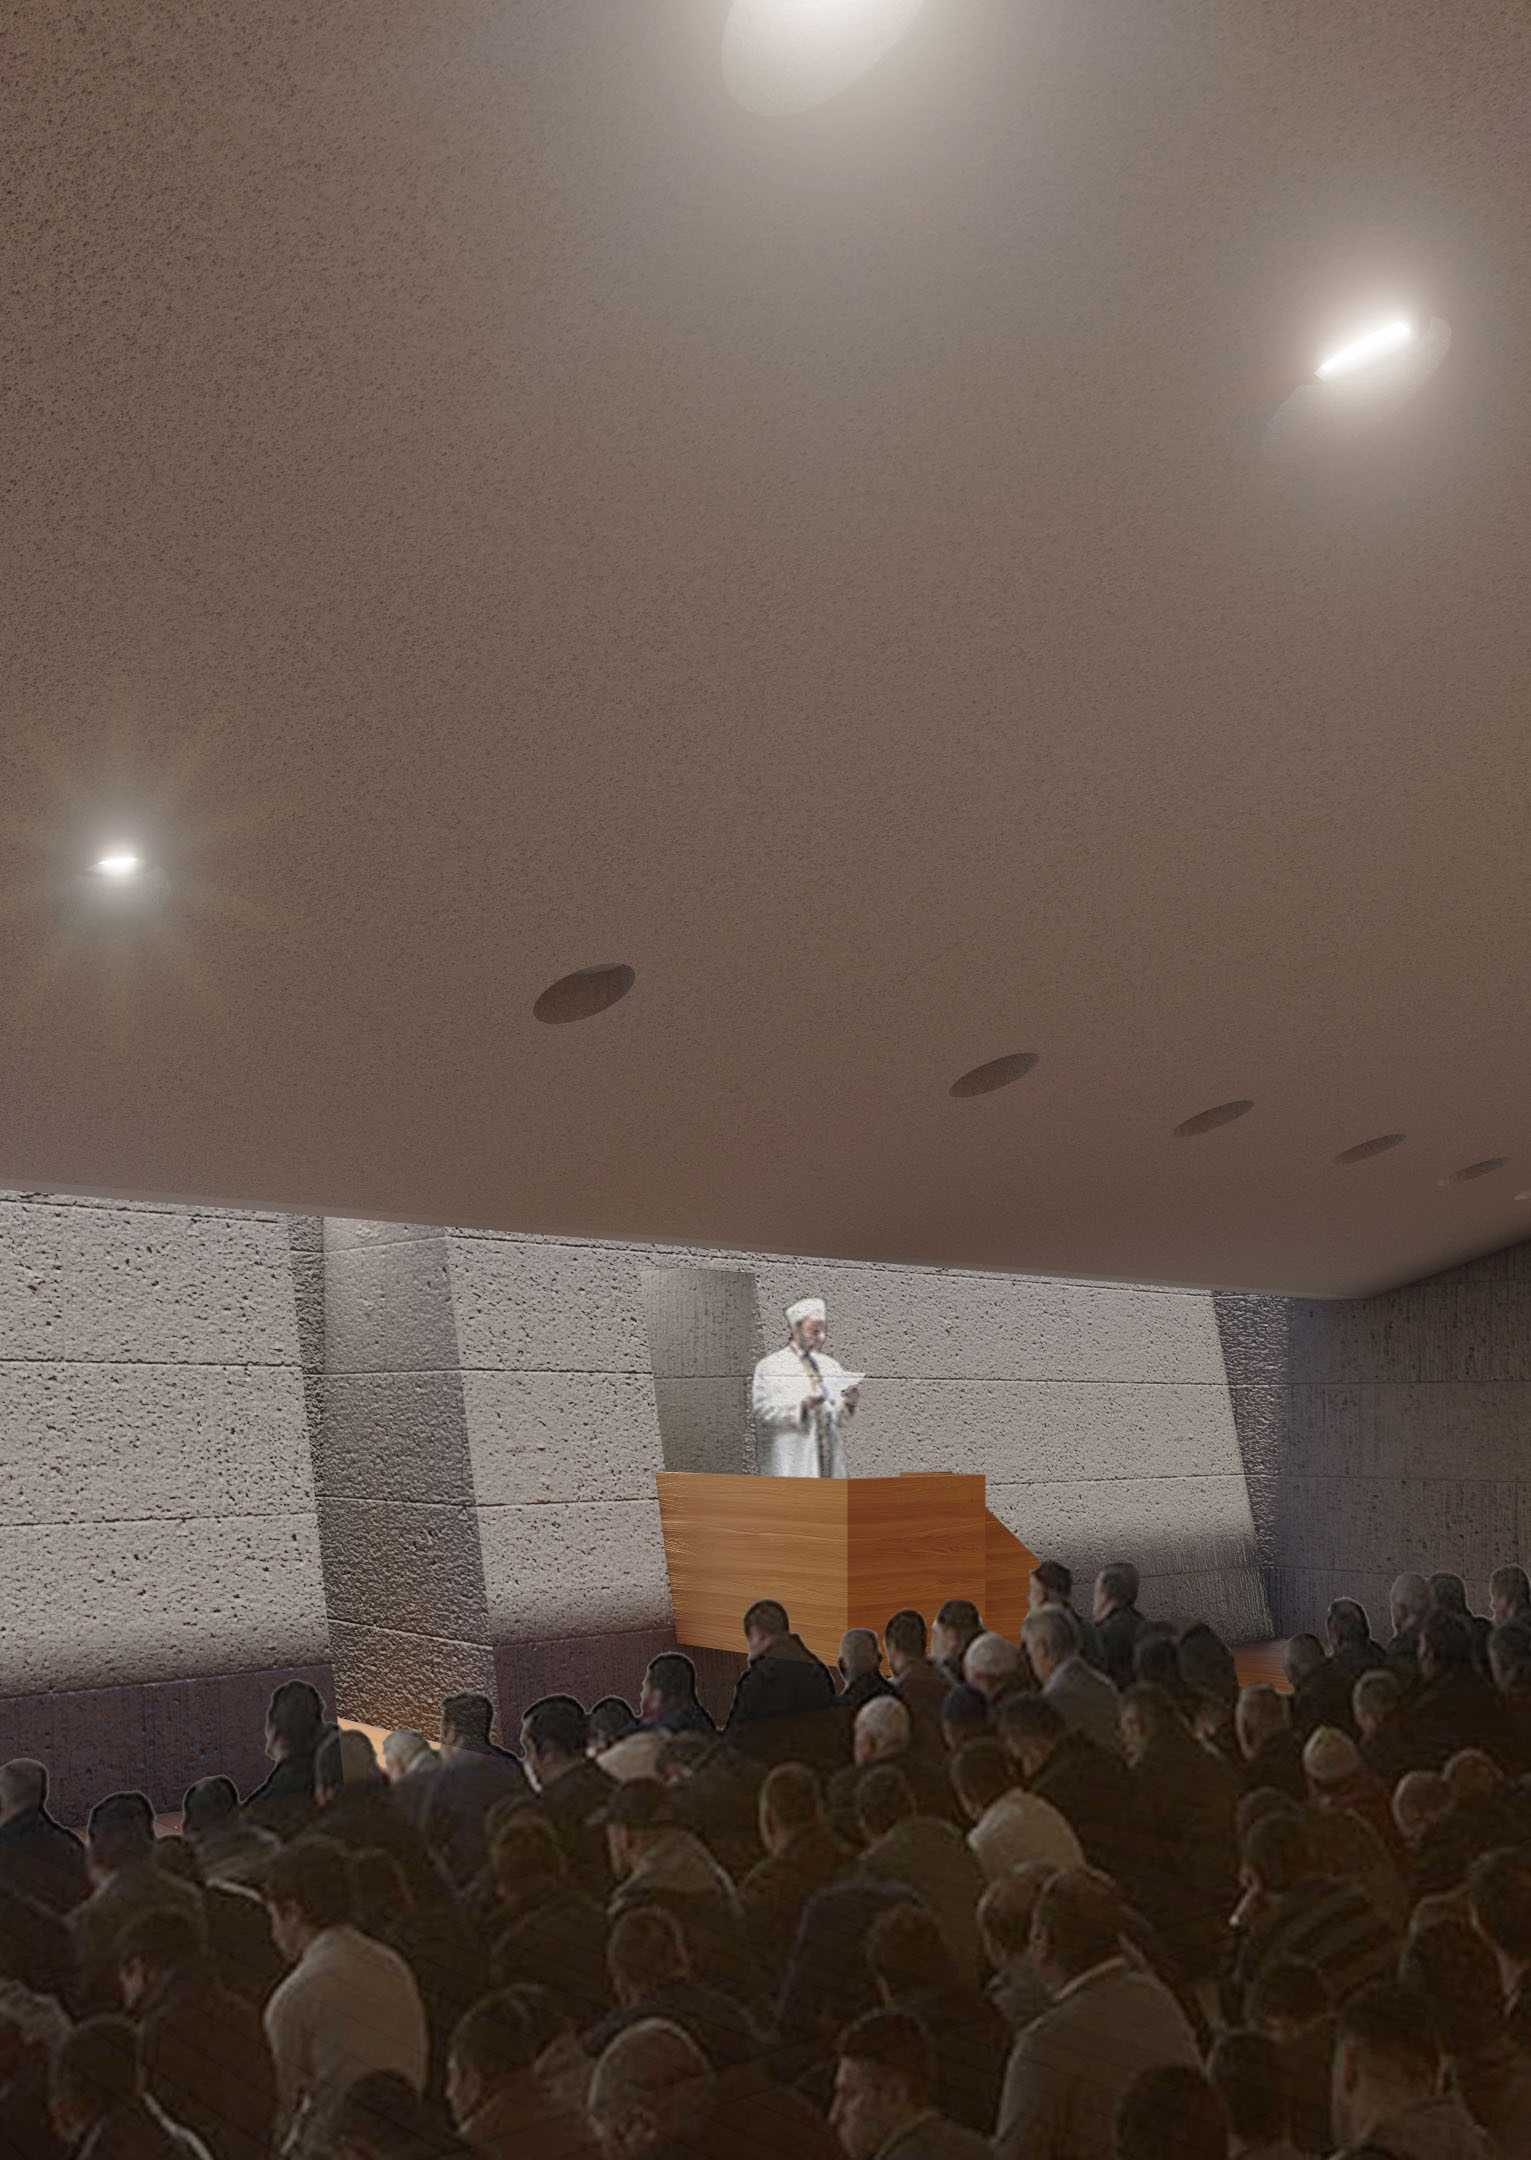 Wendi M. Padli Al Baqarah, Boyolali Boyolali, Kec. Boyolali, Kabupaten Boyolali, Jawa Tengah, Indonesia Boyolali, Kec. Boyolali, Kabupaten Boyolali, Jawa Tengah, Indonesia Wendi-M-Padli-Masjid-Ageng-Al-Baqarah   89579